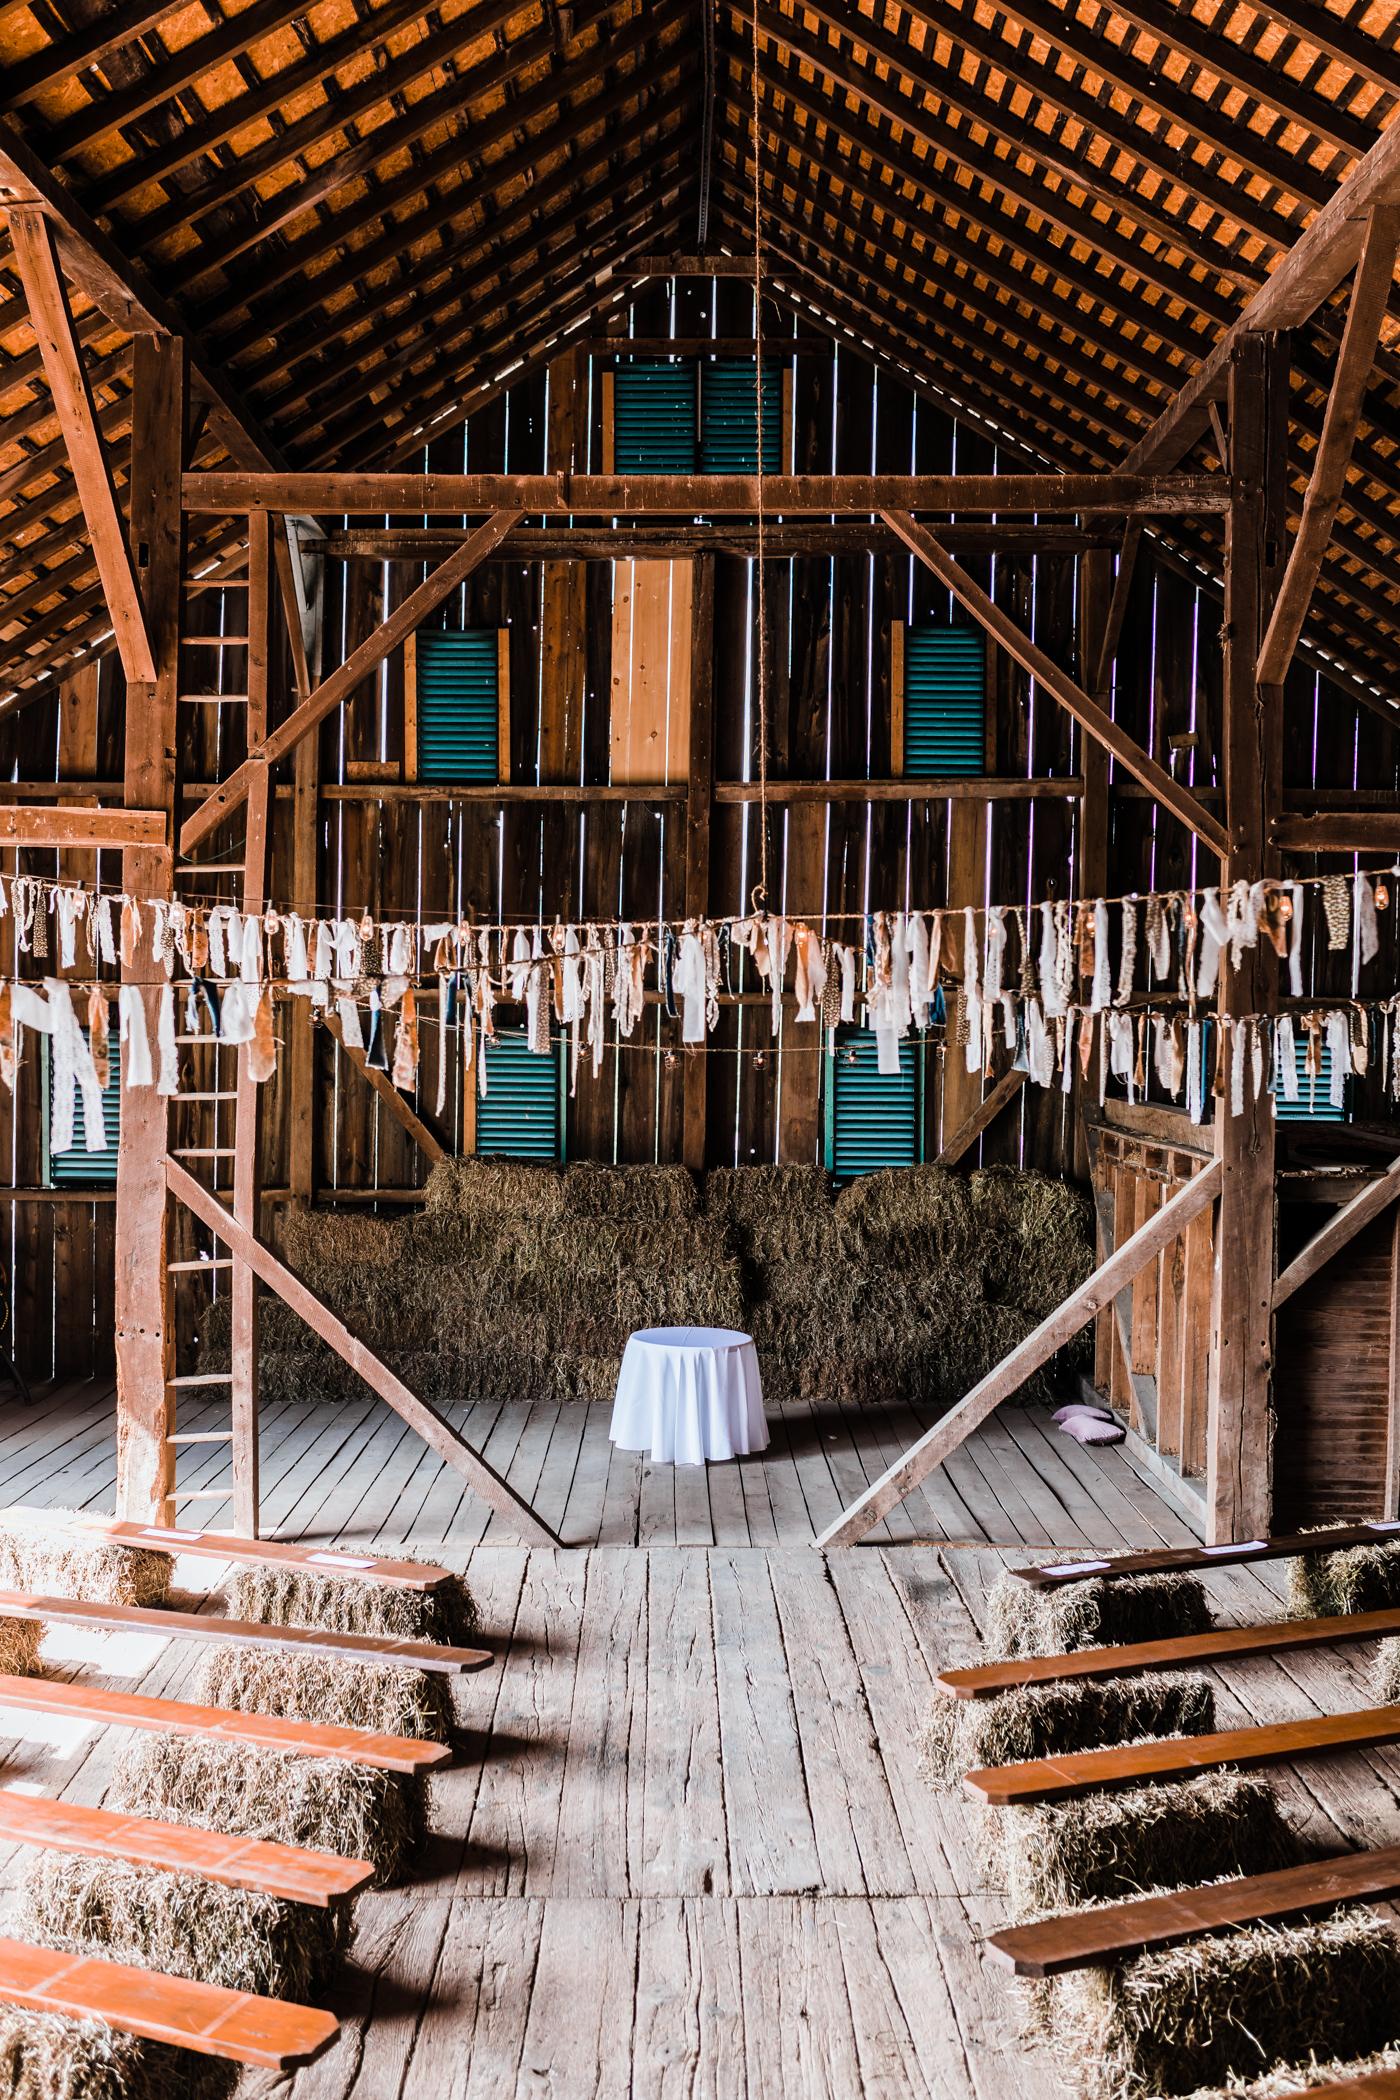 unique wedding ceremony in barn - maryland wedding ceremony - md wedding photographer